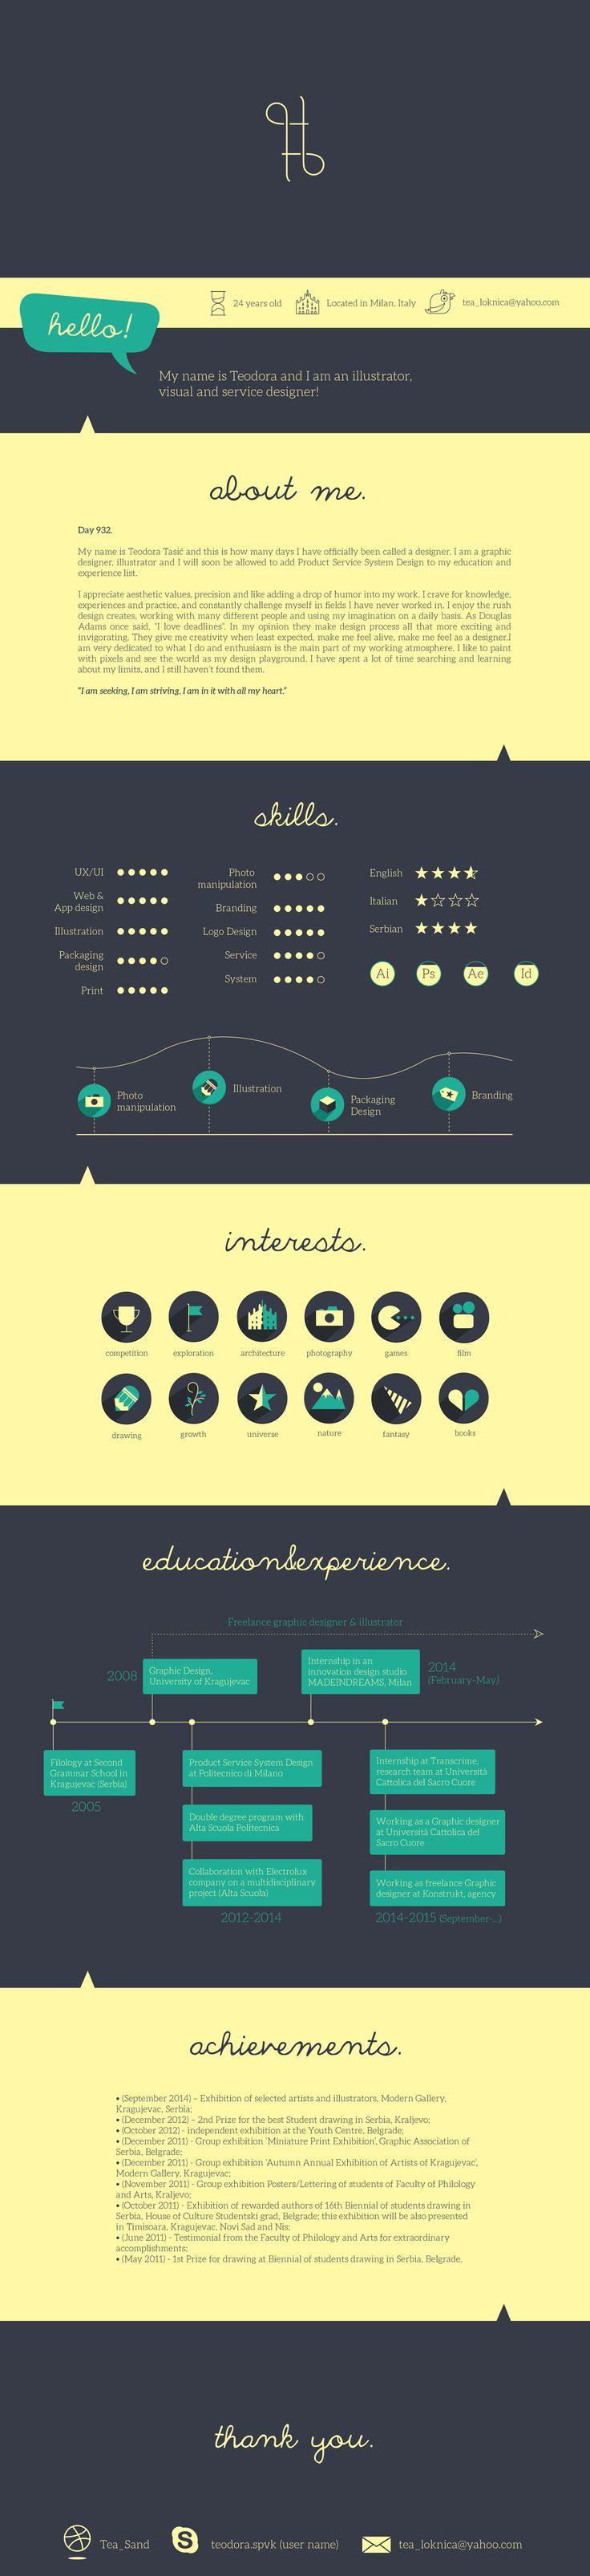 9 Best Designers CV Images On Pinterest